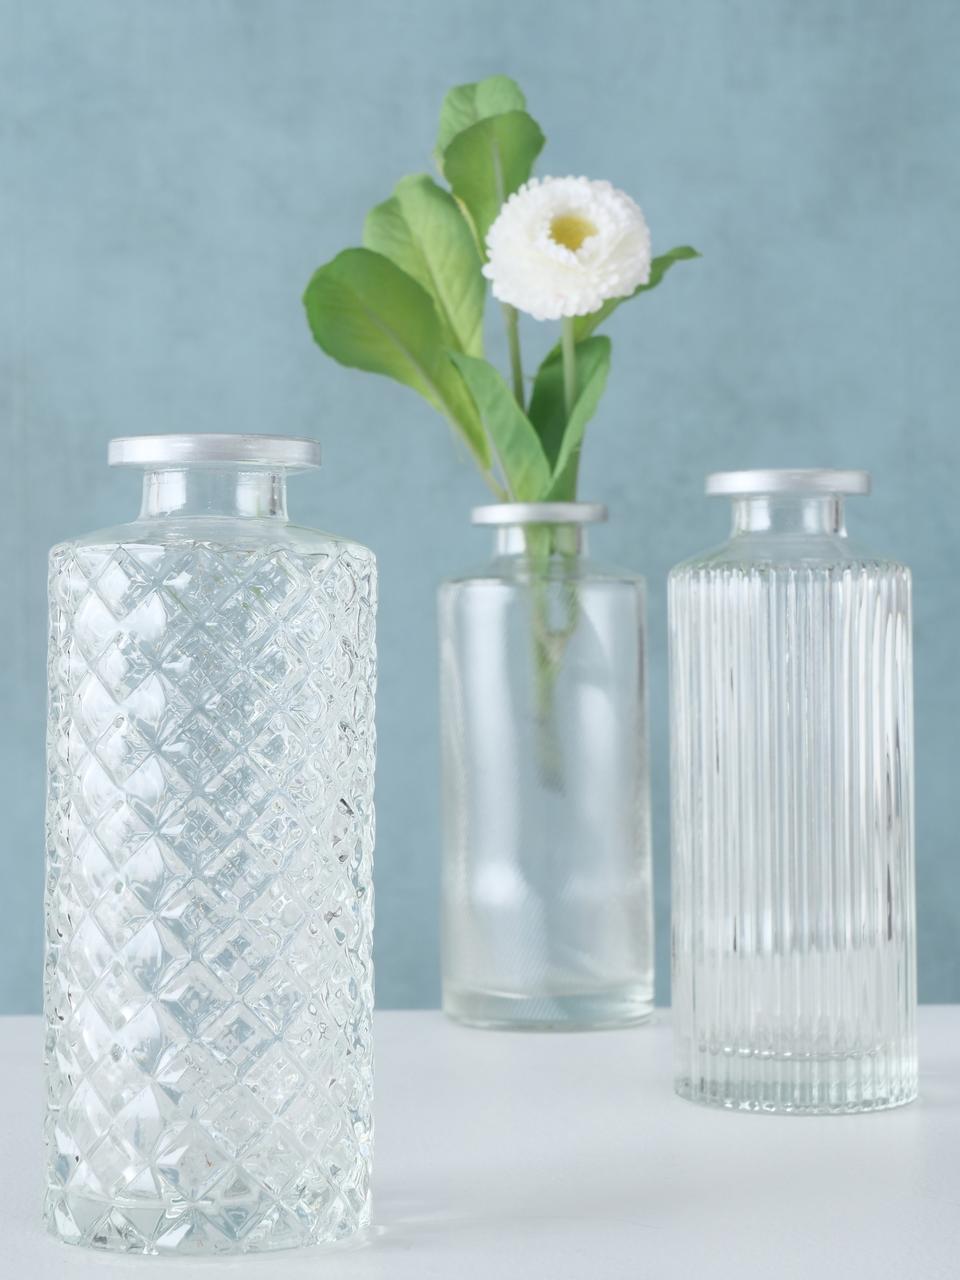 Kleines Vasen-Set Adore aus Glas, 3-tlg., Glas, Transparent, Ø 5 x H 13 cm